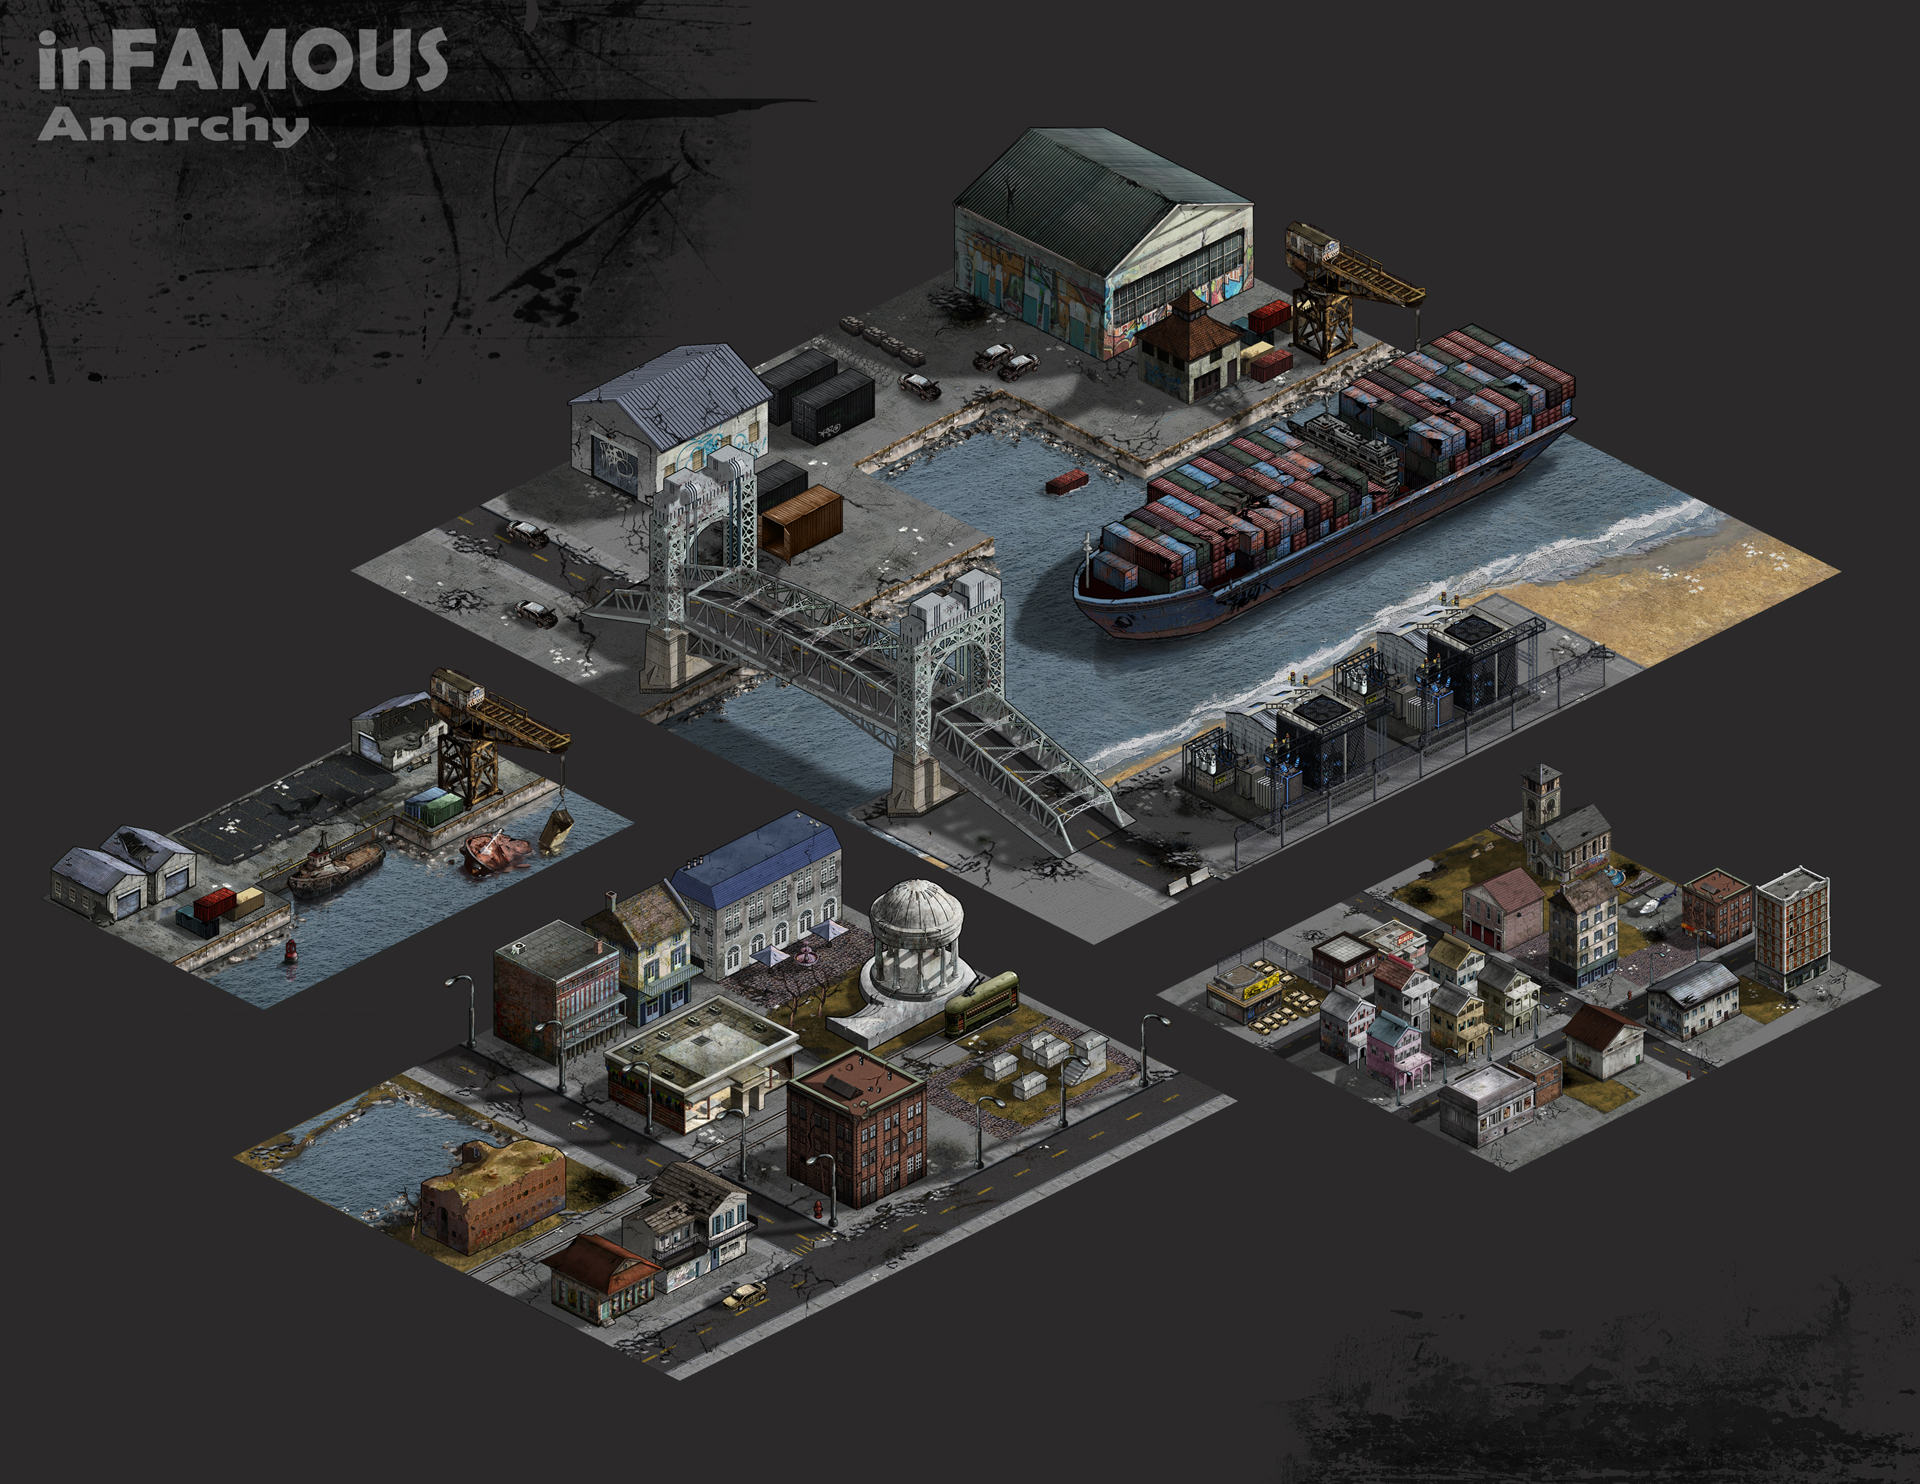 KJ Yu's work on SCEA's social game Infamous Anarchy